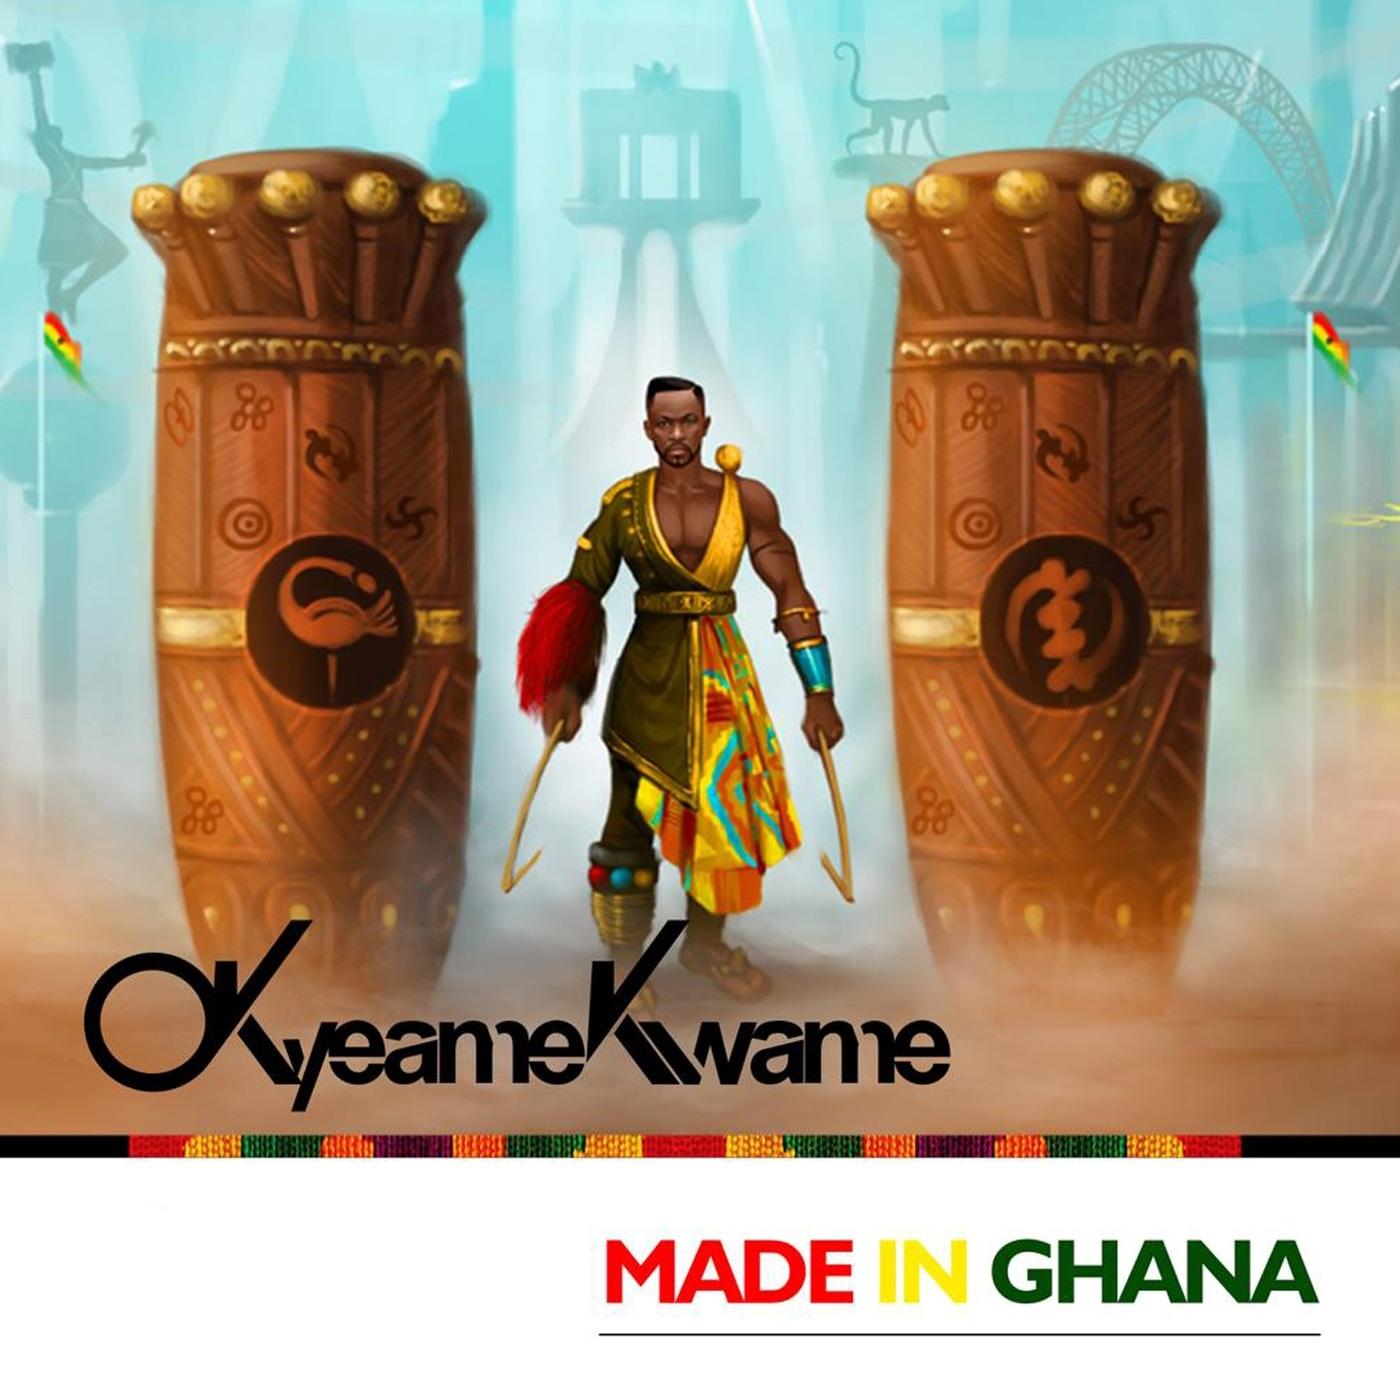 Okyeame Kwame Madeingh